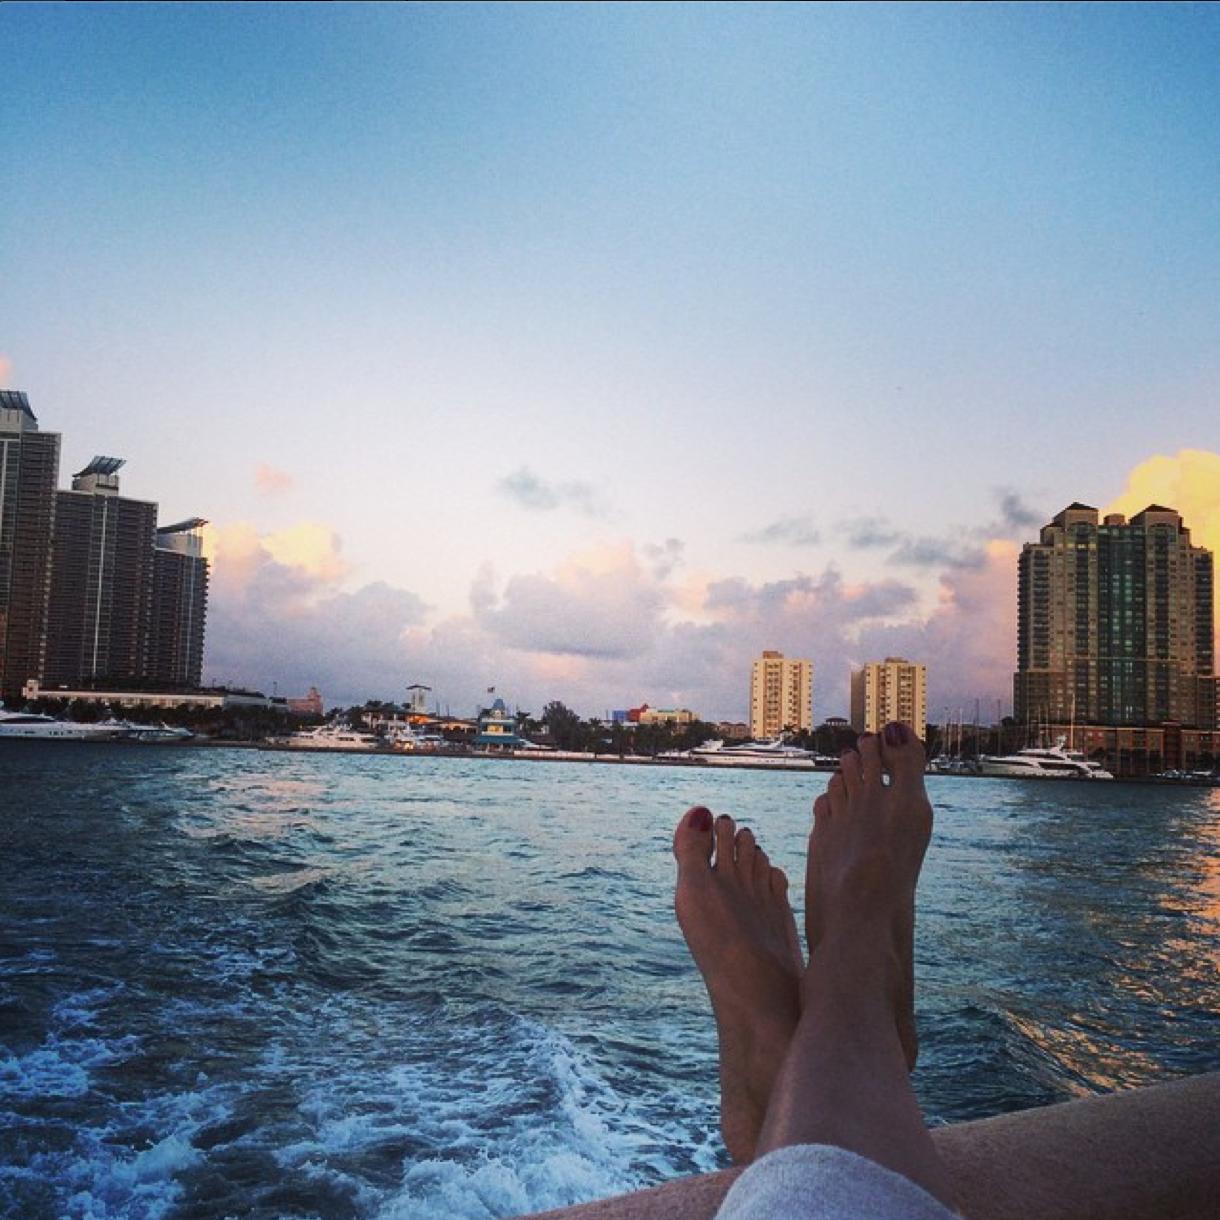 Image courtesy of Instagram/heidiklum